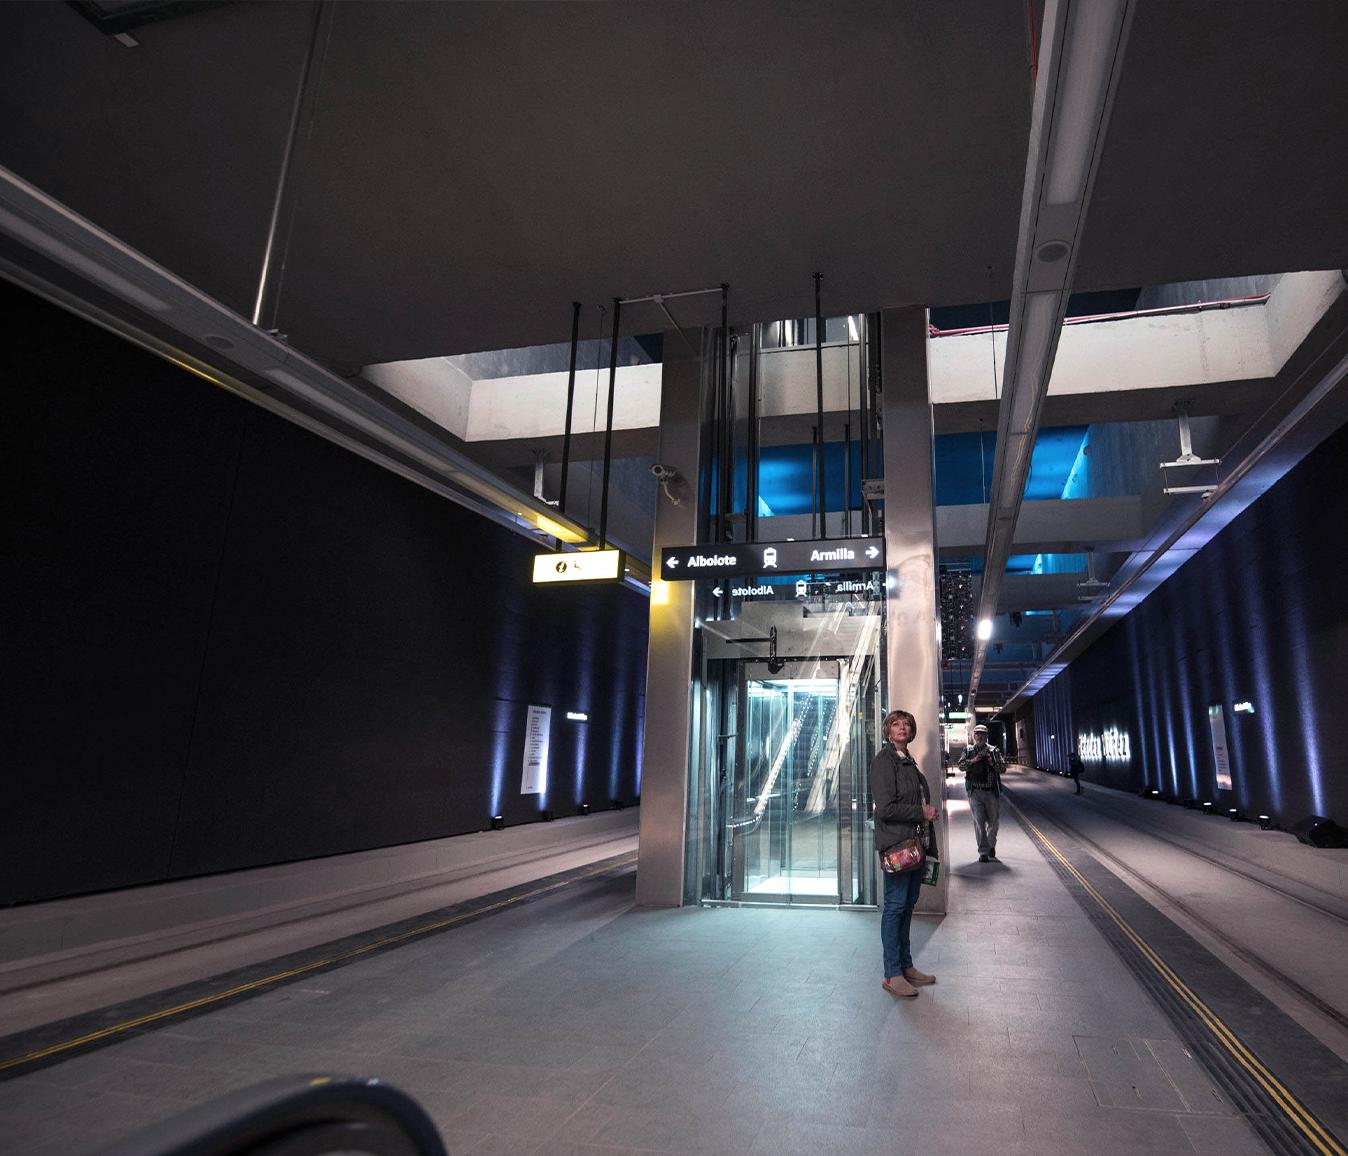 UNDERGROUND-cabin-paragon-lift-embarba-paragon-1